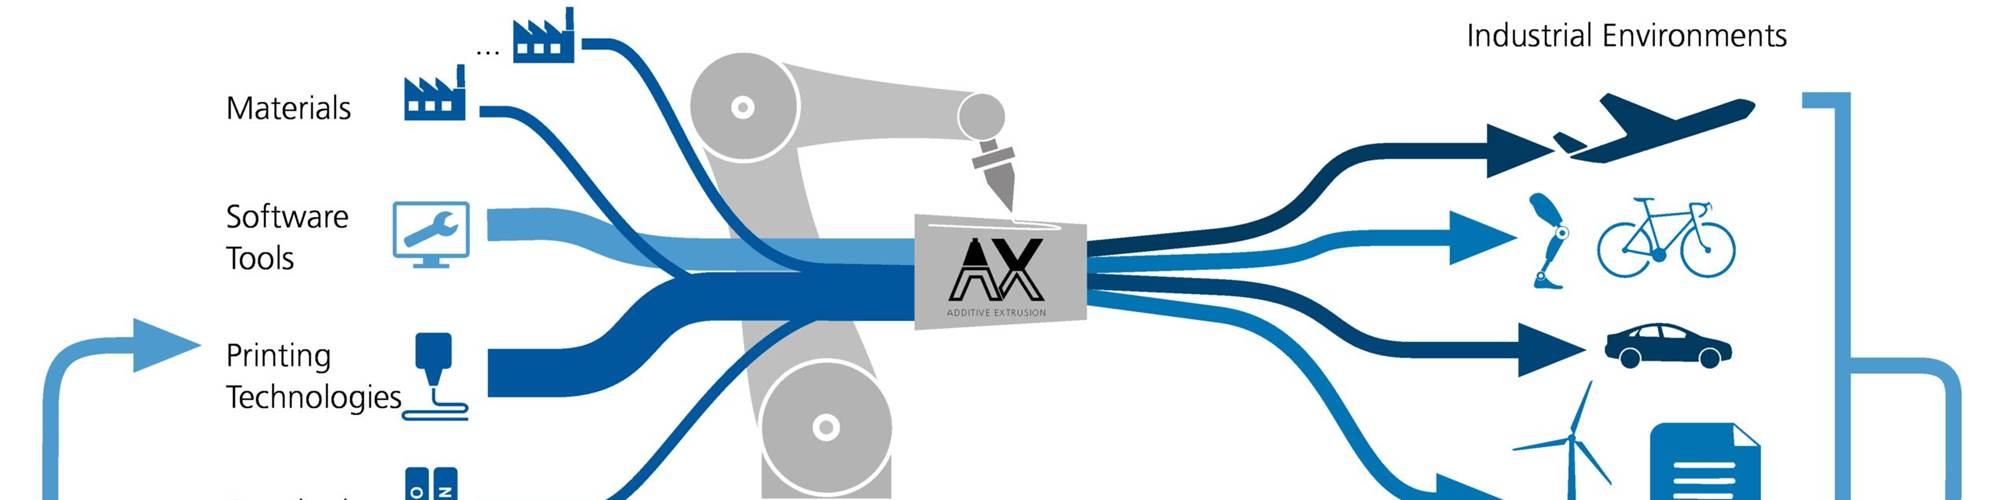 DLR EmpowerAX Additive Extrusion Innovation Lab